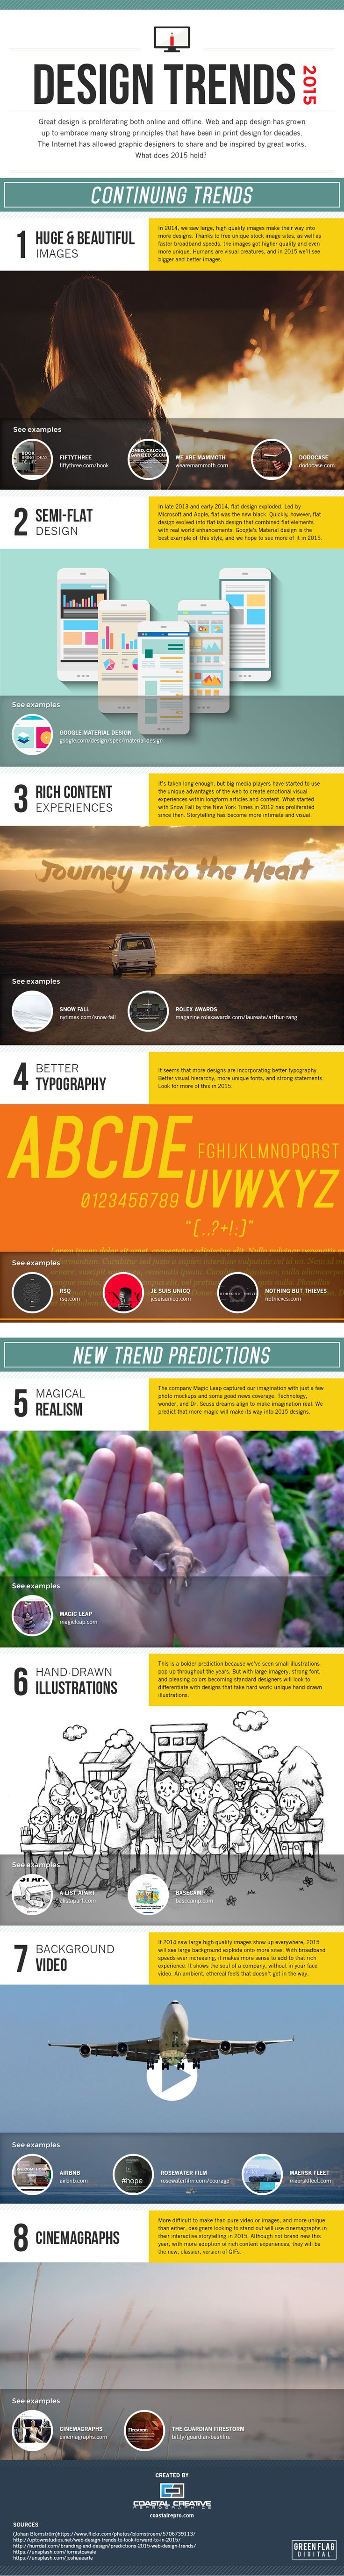 8 Design Trends for 2015 #infographic #GraphicDesign #Design #WebDesign